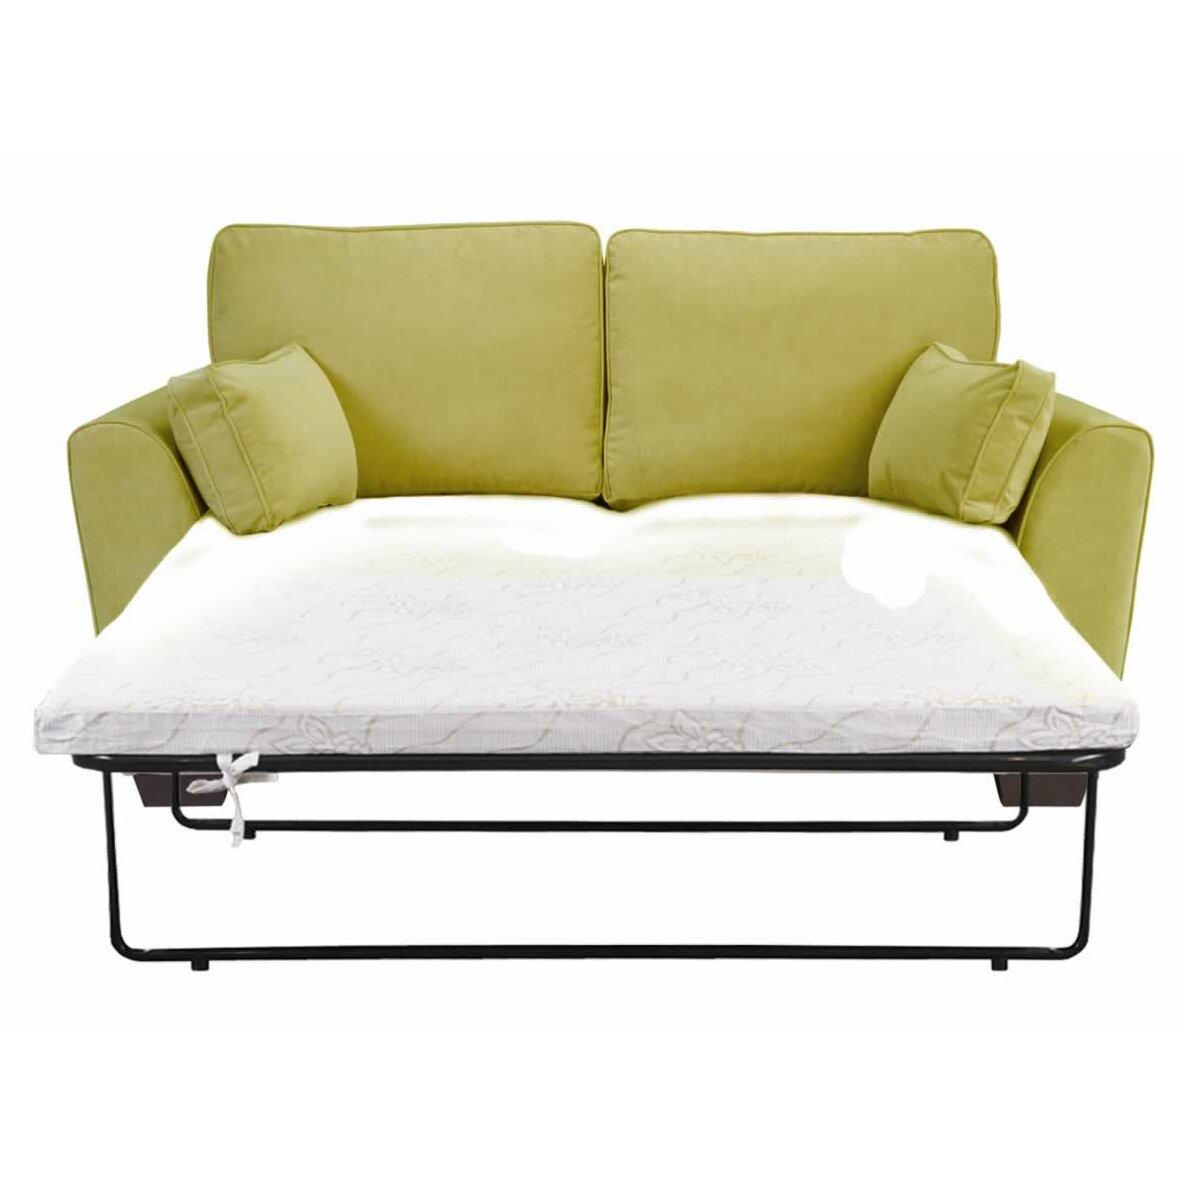 Mercury row virginis 2 seater sofa bed reviews wayfair uk for Sofa bed 5 seater